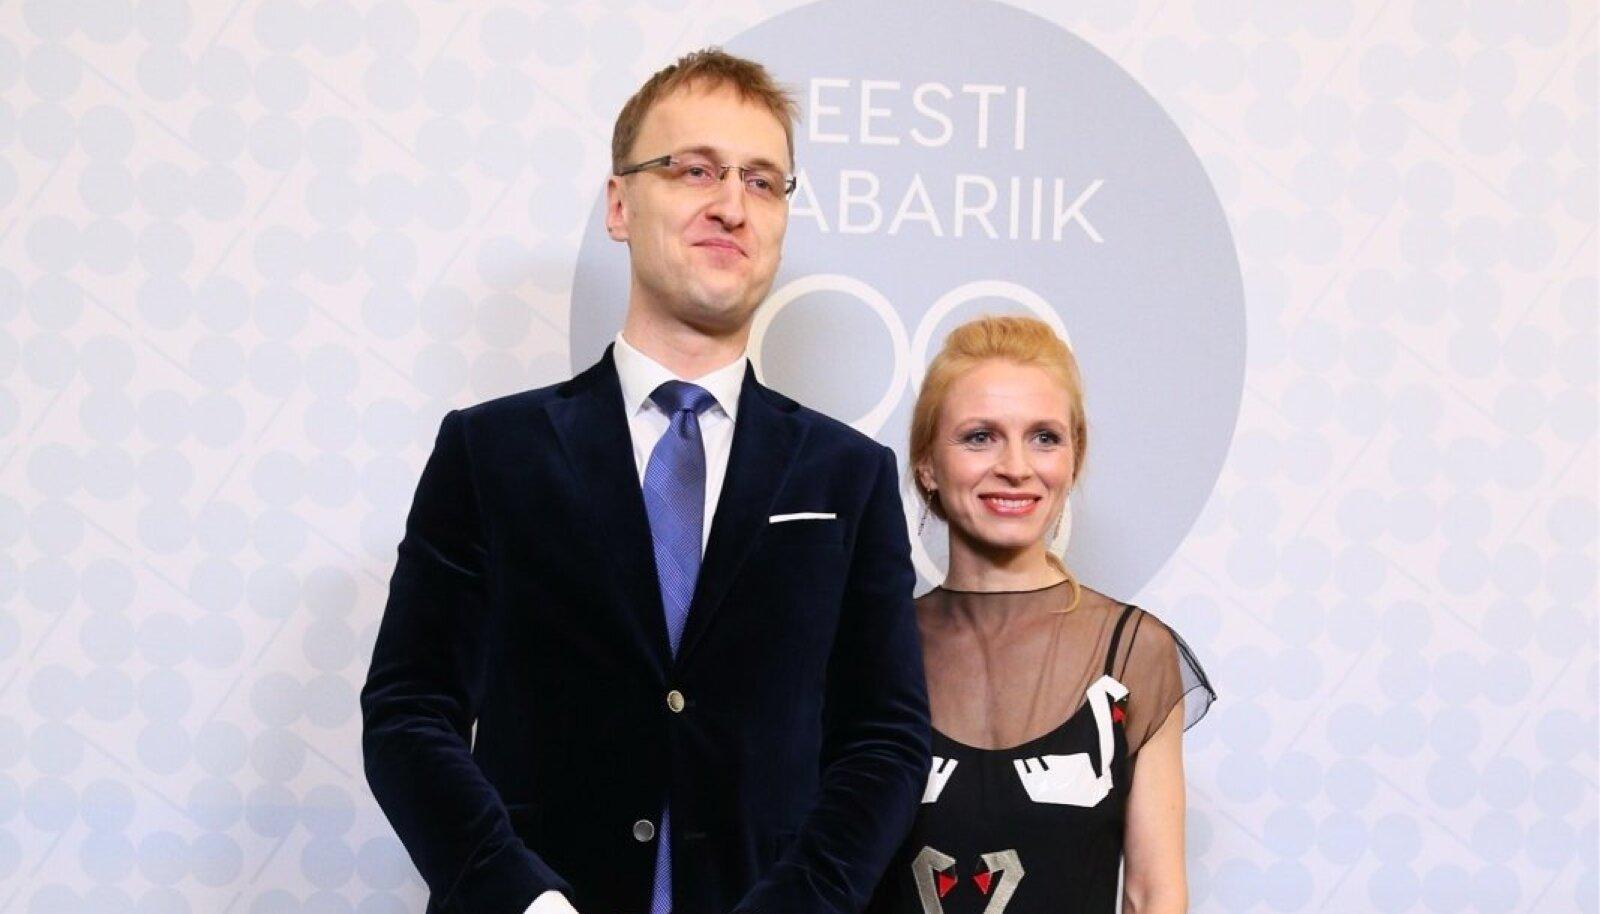 Mart Koldits, Eva Koldits